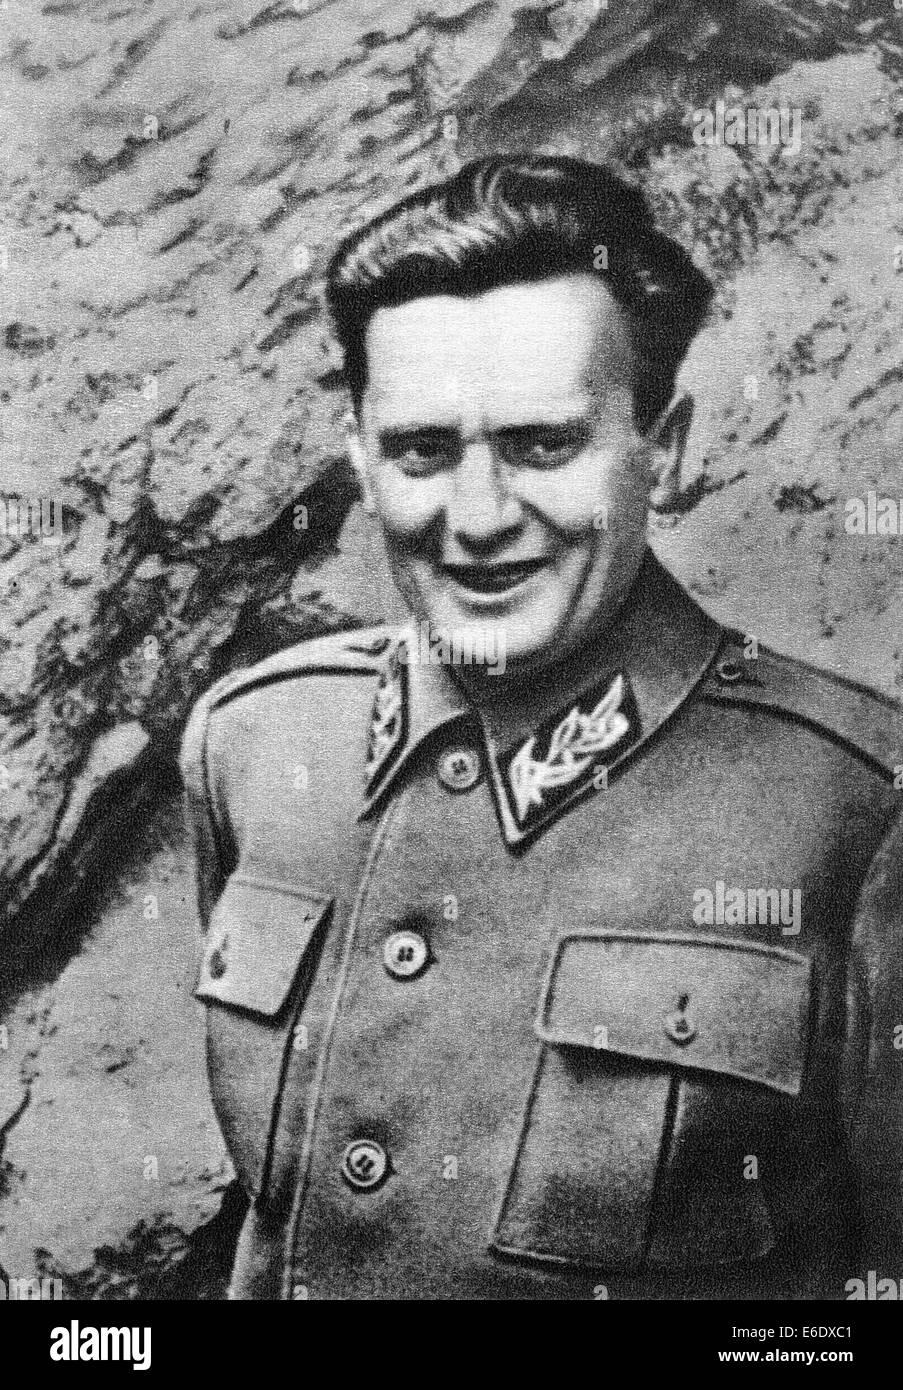 Josip Broz Tito (1892-1980), Revolutionary, Statesman and 1st President of Yugoslavia, Portrait, circa 1941 - Stock Image